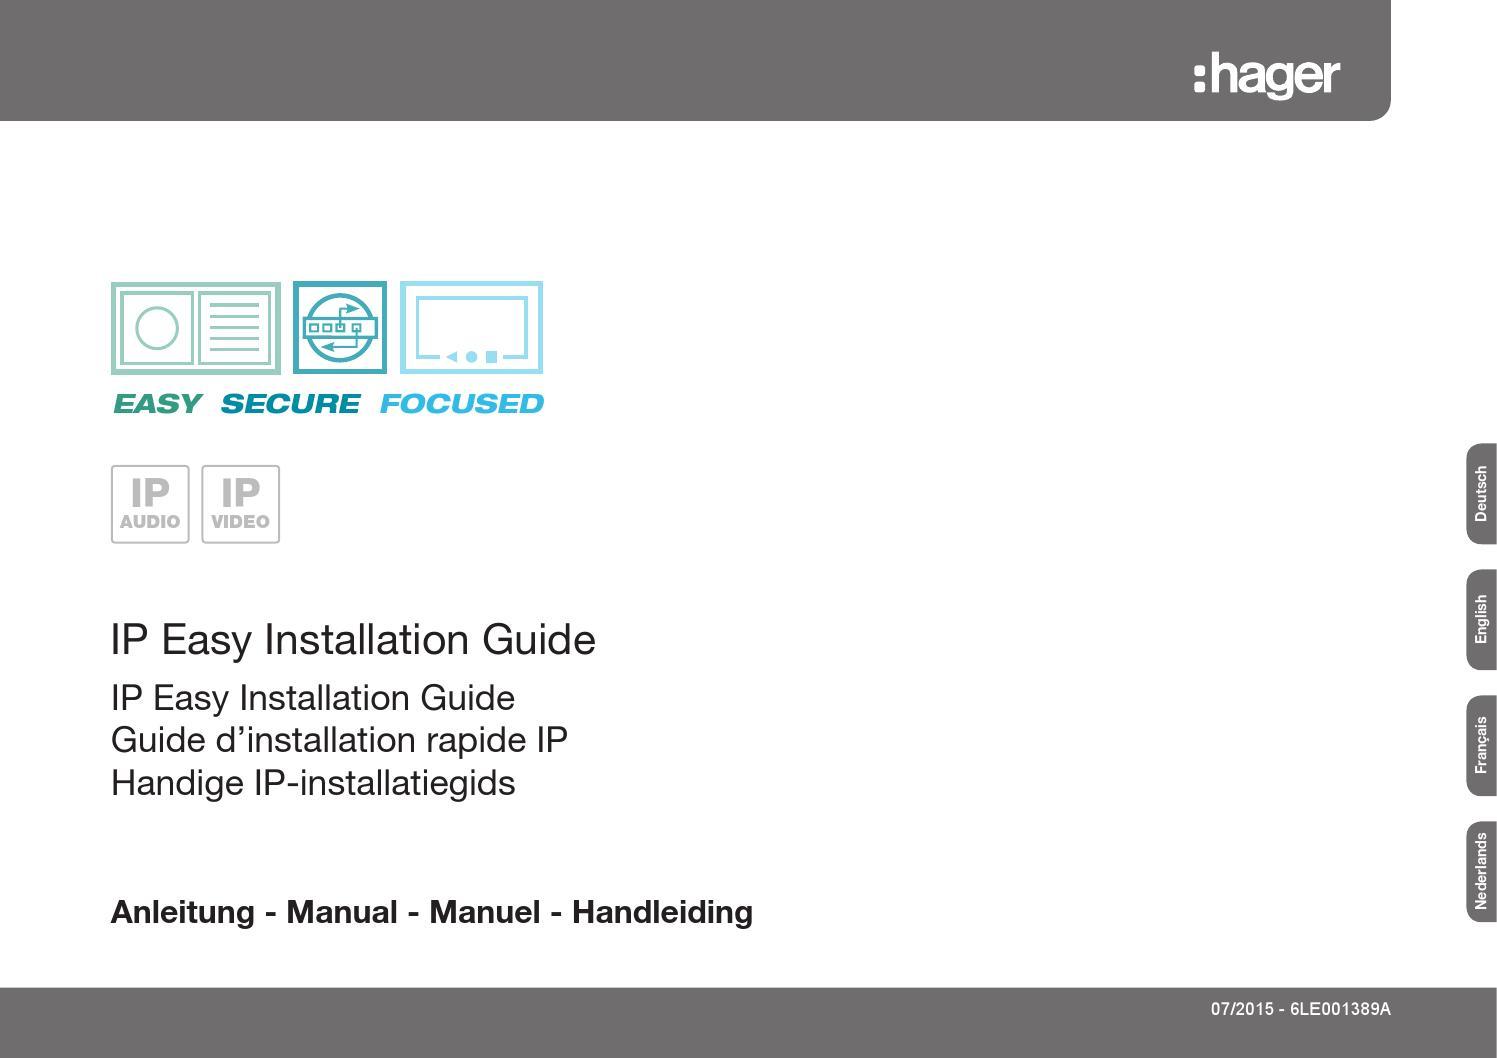 hager ip easy installation guide v21 07 2015 by elcom kommunikation gmbh issuu